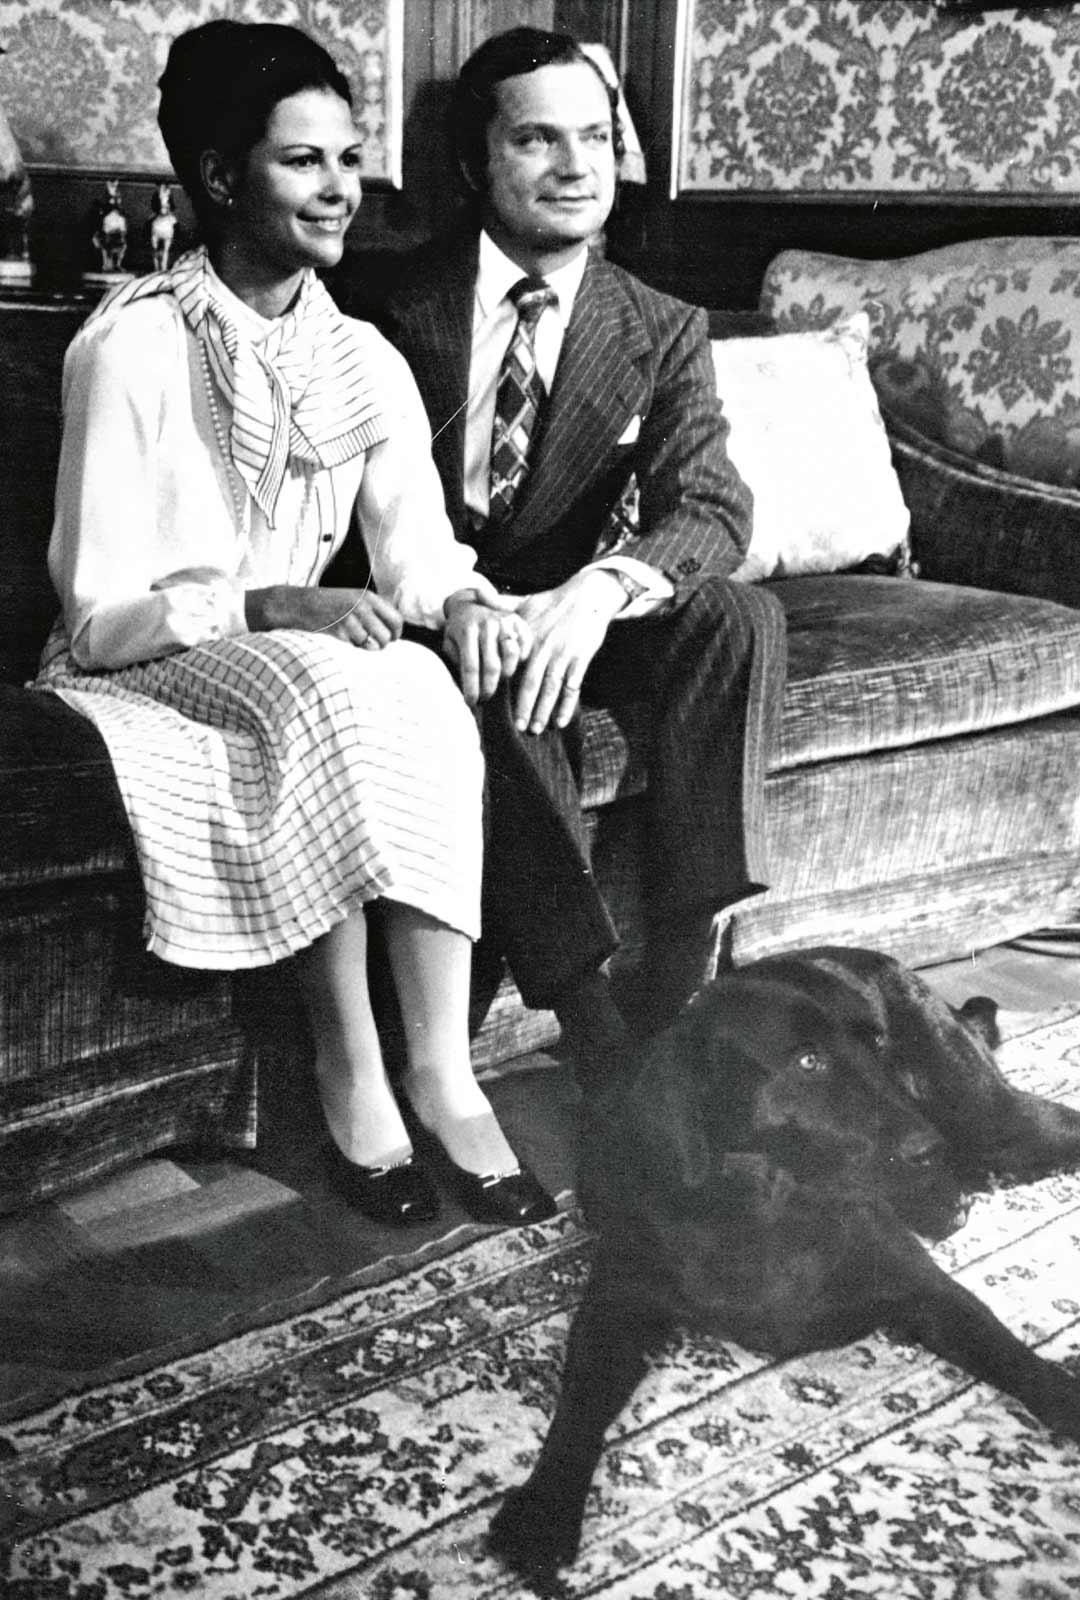 Kuningas Kaarle Kustaa ja Silvia Sommerlath